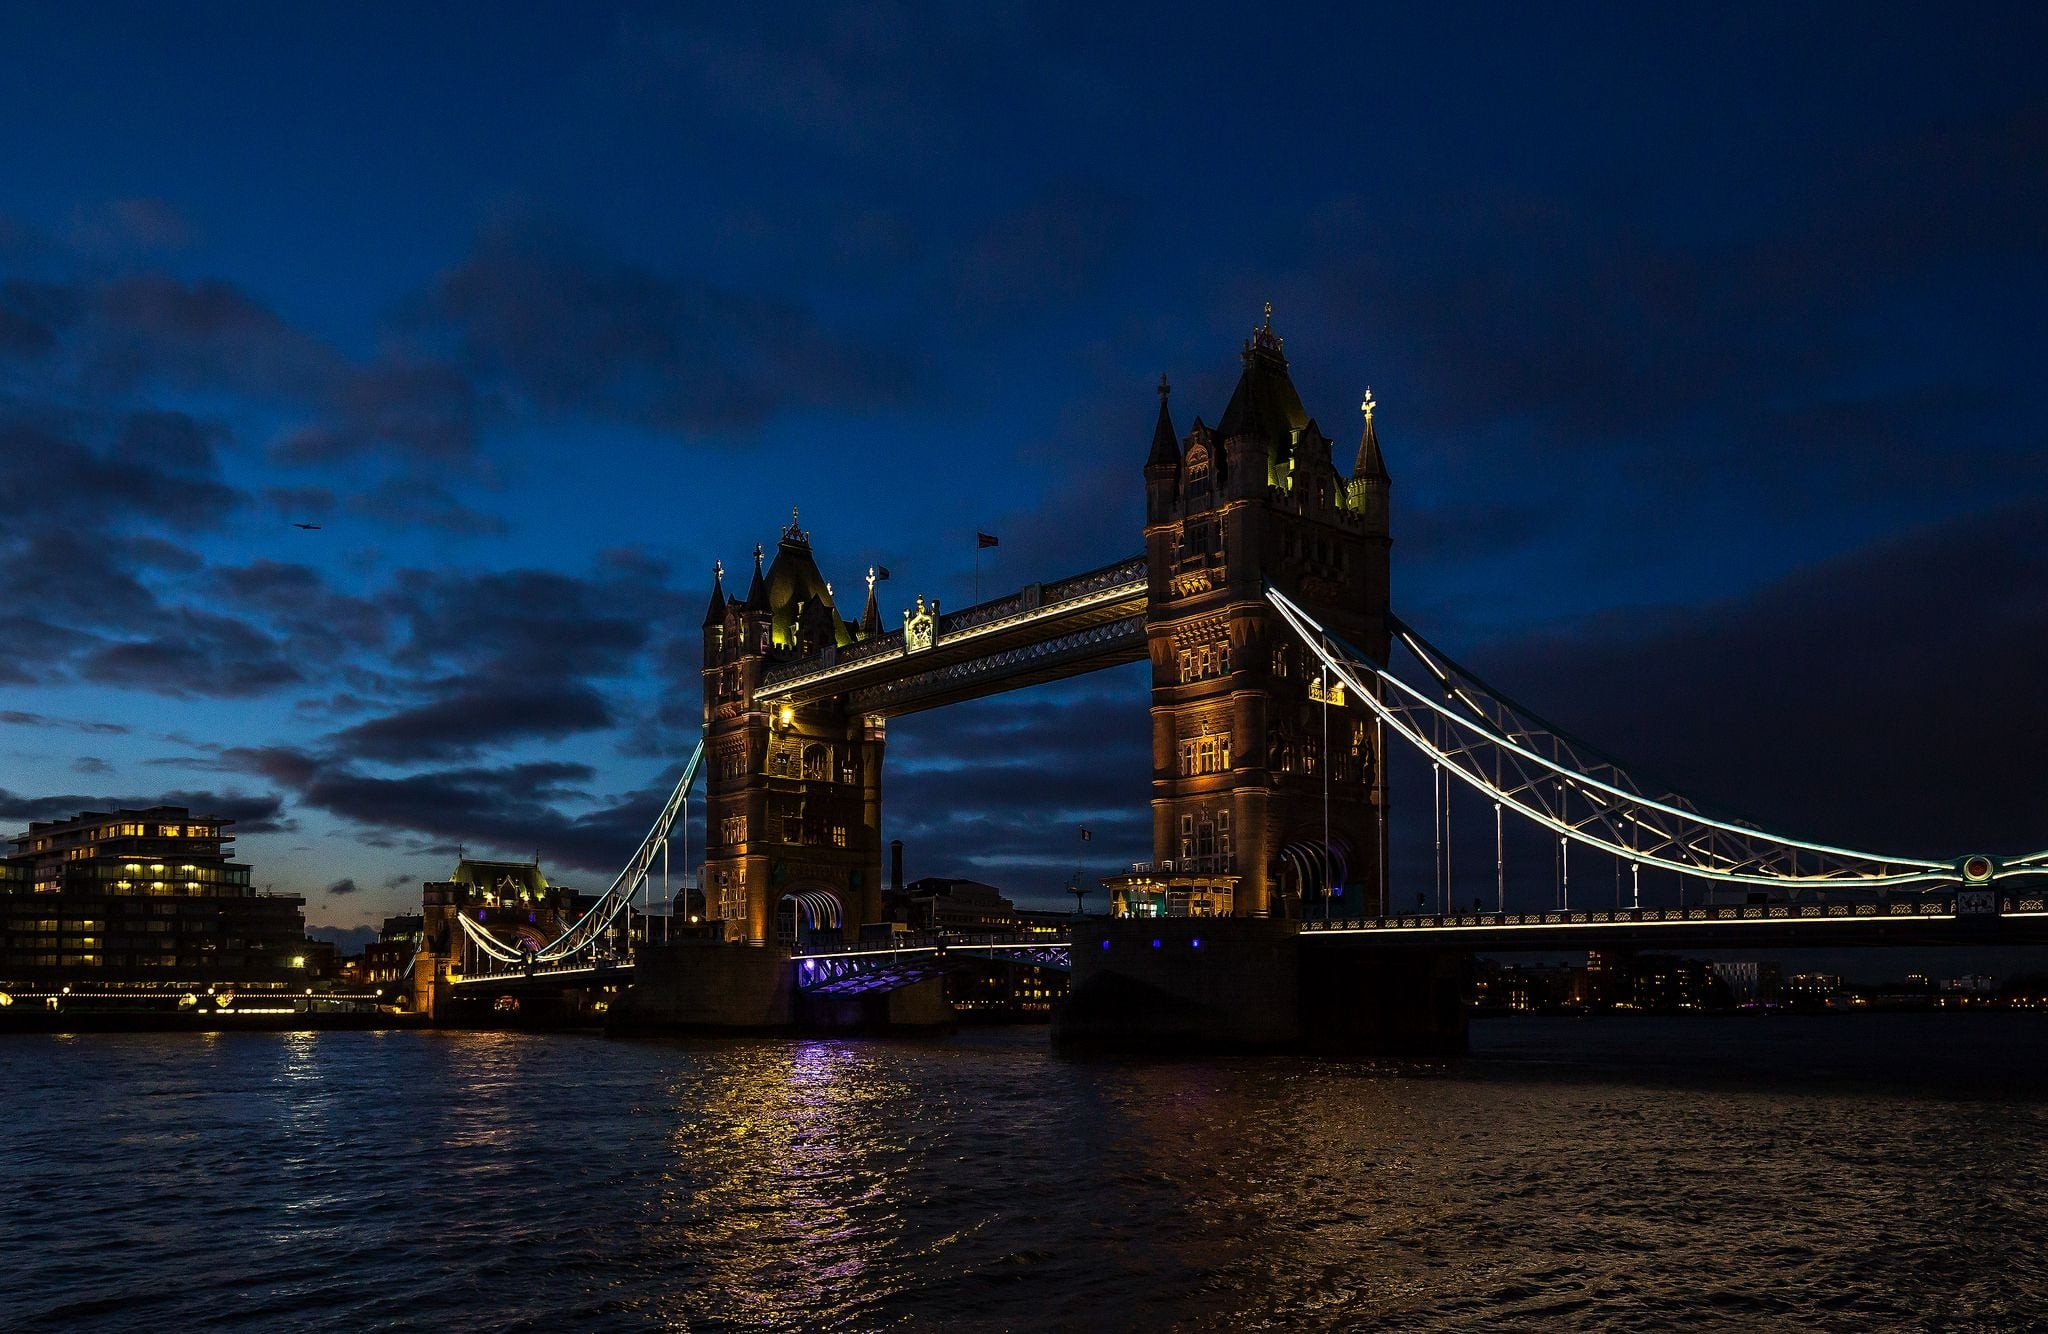 Res: 2048x1334, London Tower Bridge night